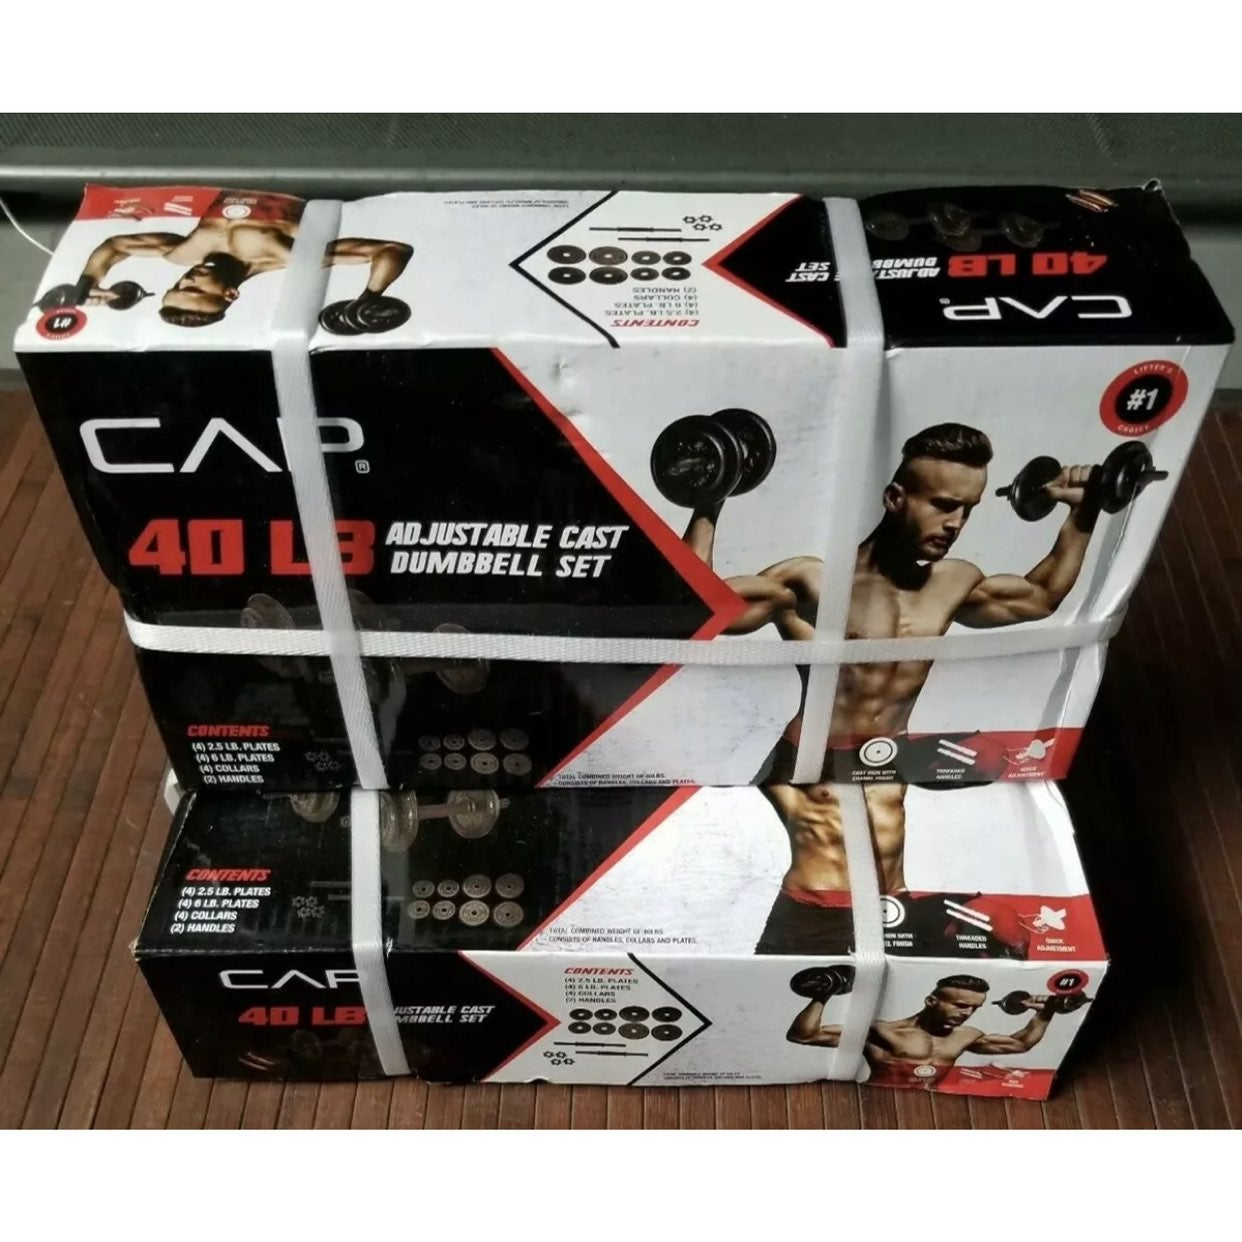 CAP 40 Lb Adjustable Dumbbell Weight Set